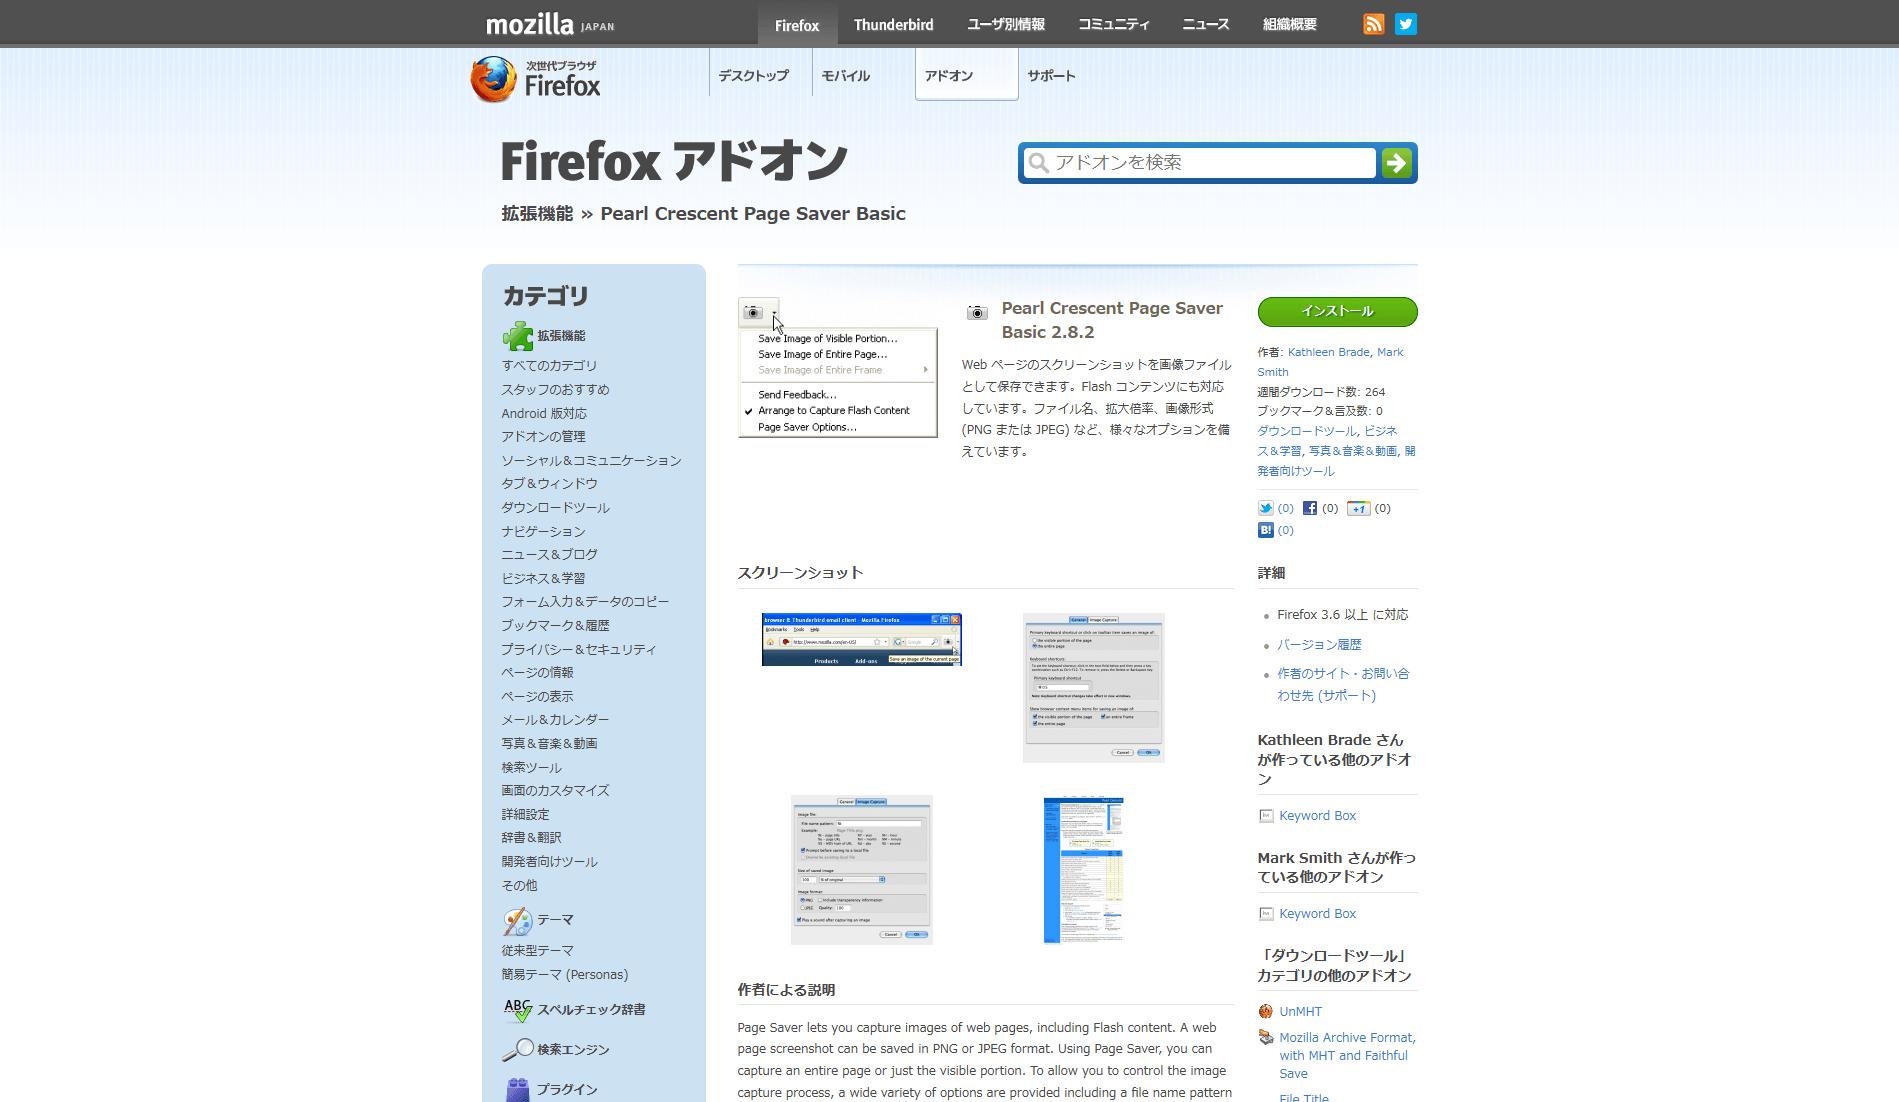 Pearl Crescent Page Saver Basic  Firefox アドオン  Mozilla Japan の公式アドオン紹介サイト